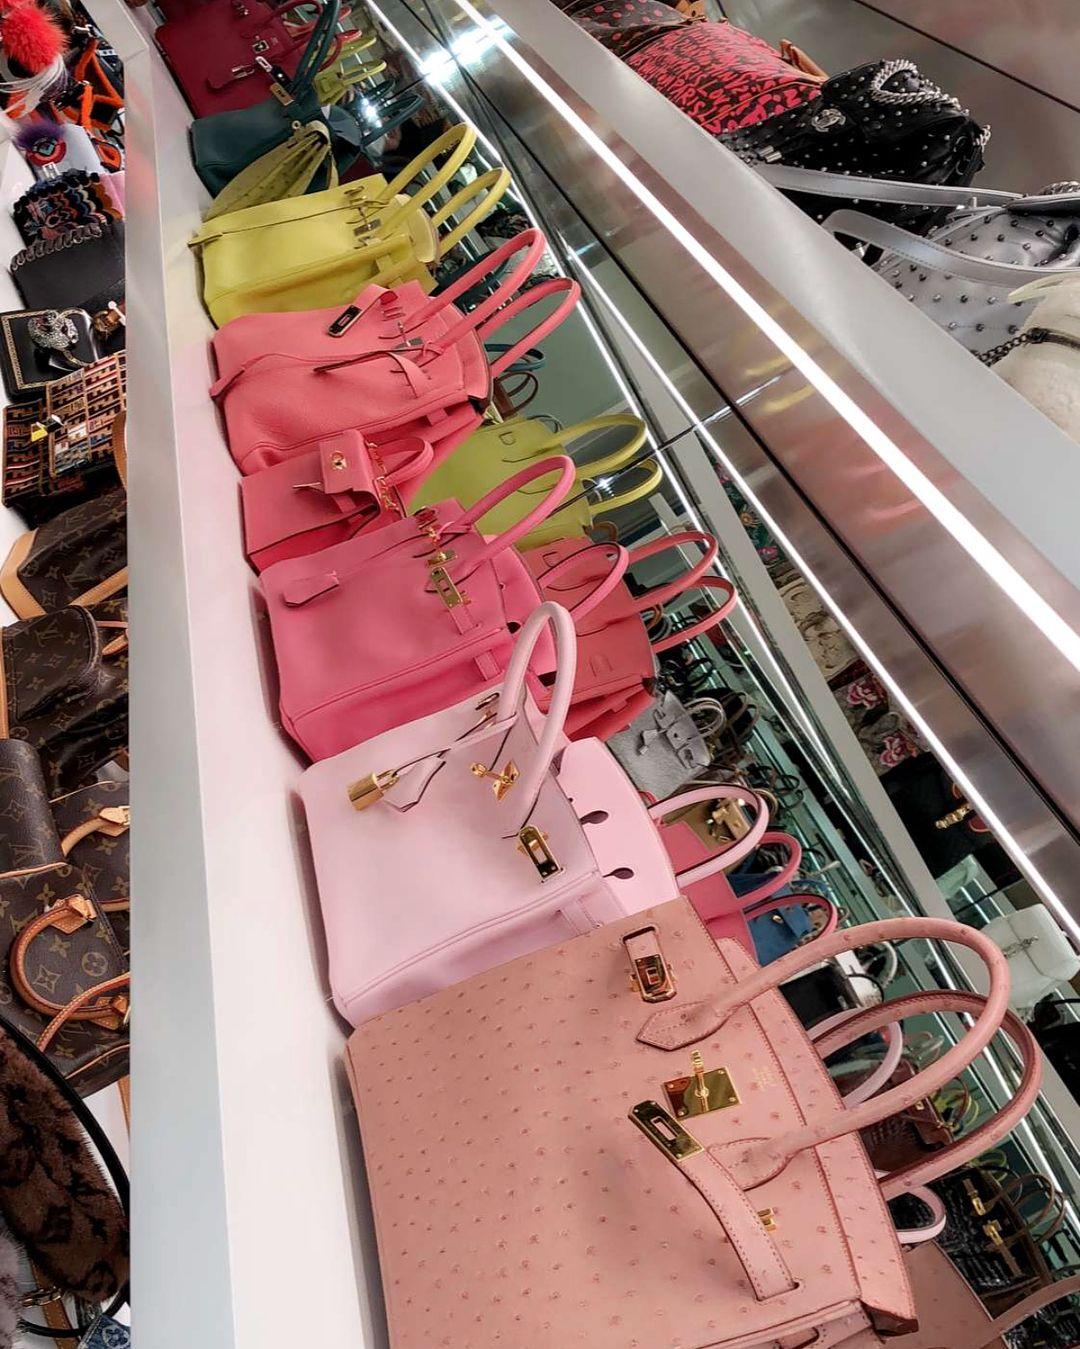 "19b5a5545 380 curtidas, 5 comentários - KYLIE JENNER HOUSE (@kyliejennerhouse) no  Instagram: ""Kylies Handbag & Purse Closet // Via Instagram#KylieJennerHouse  ..."